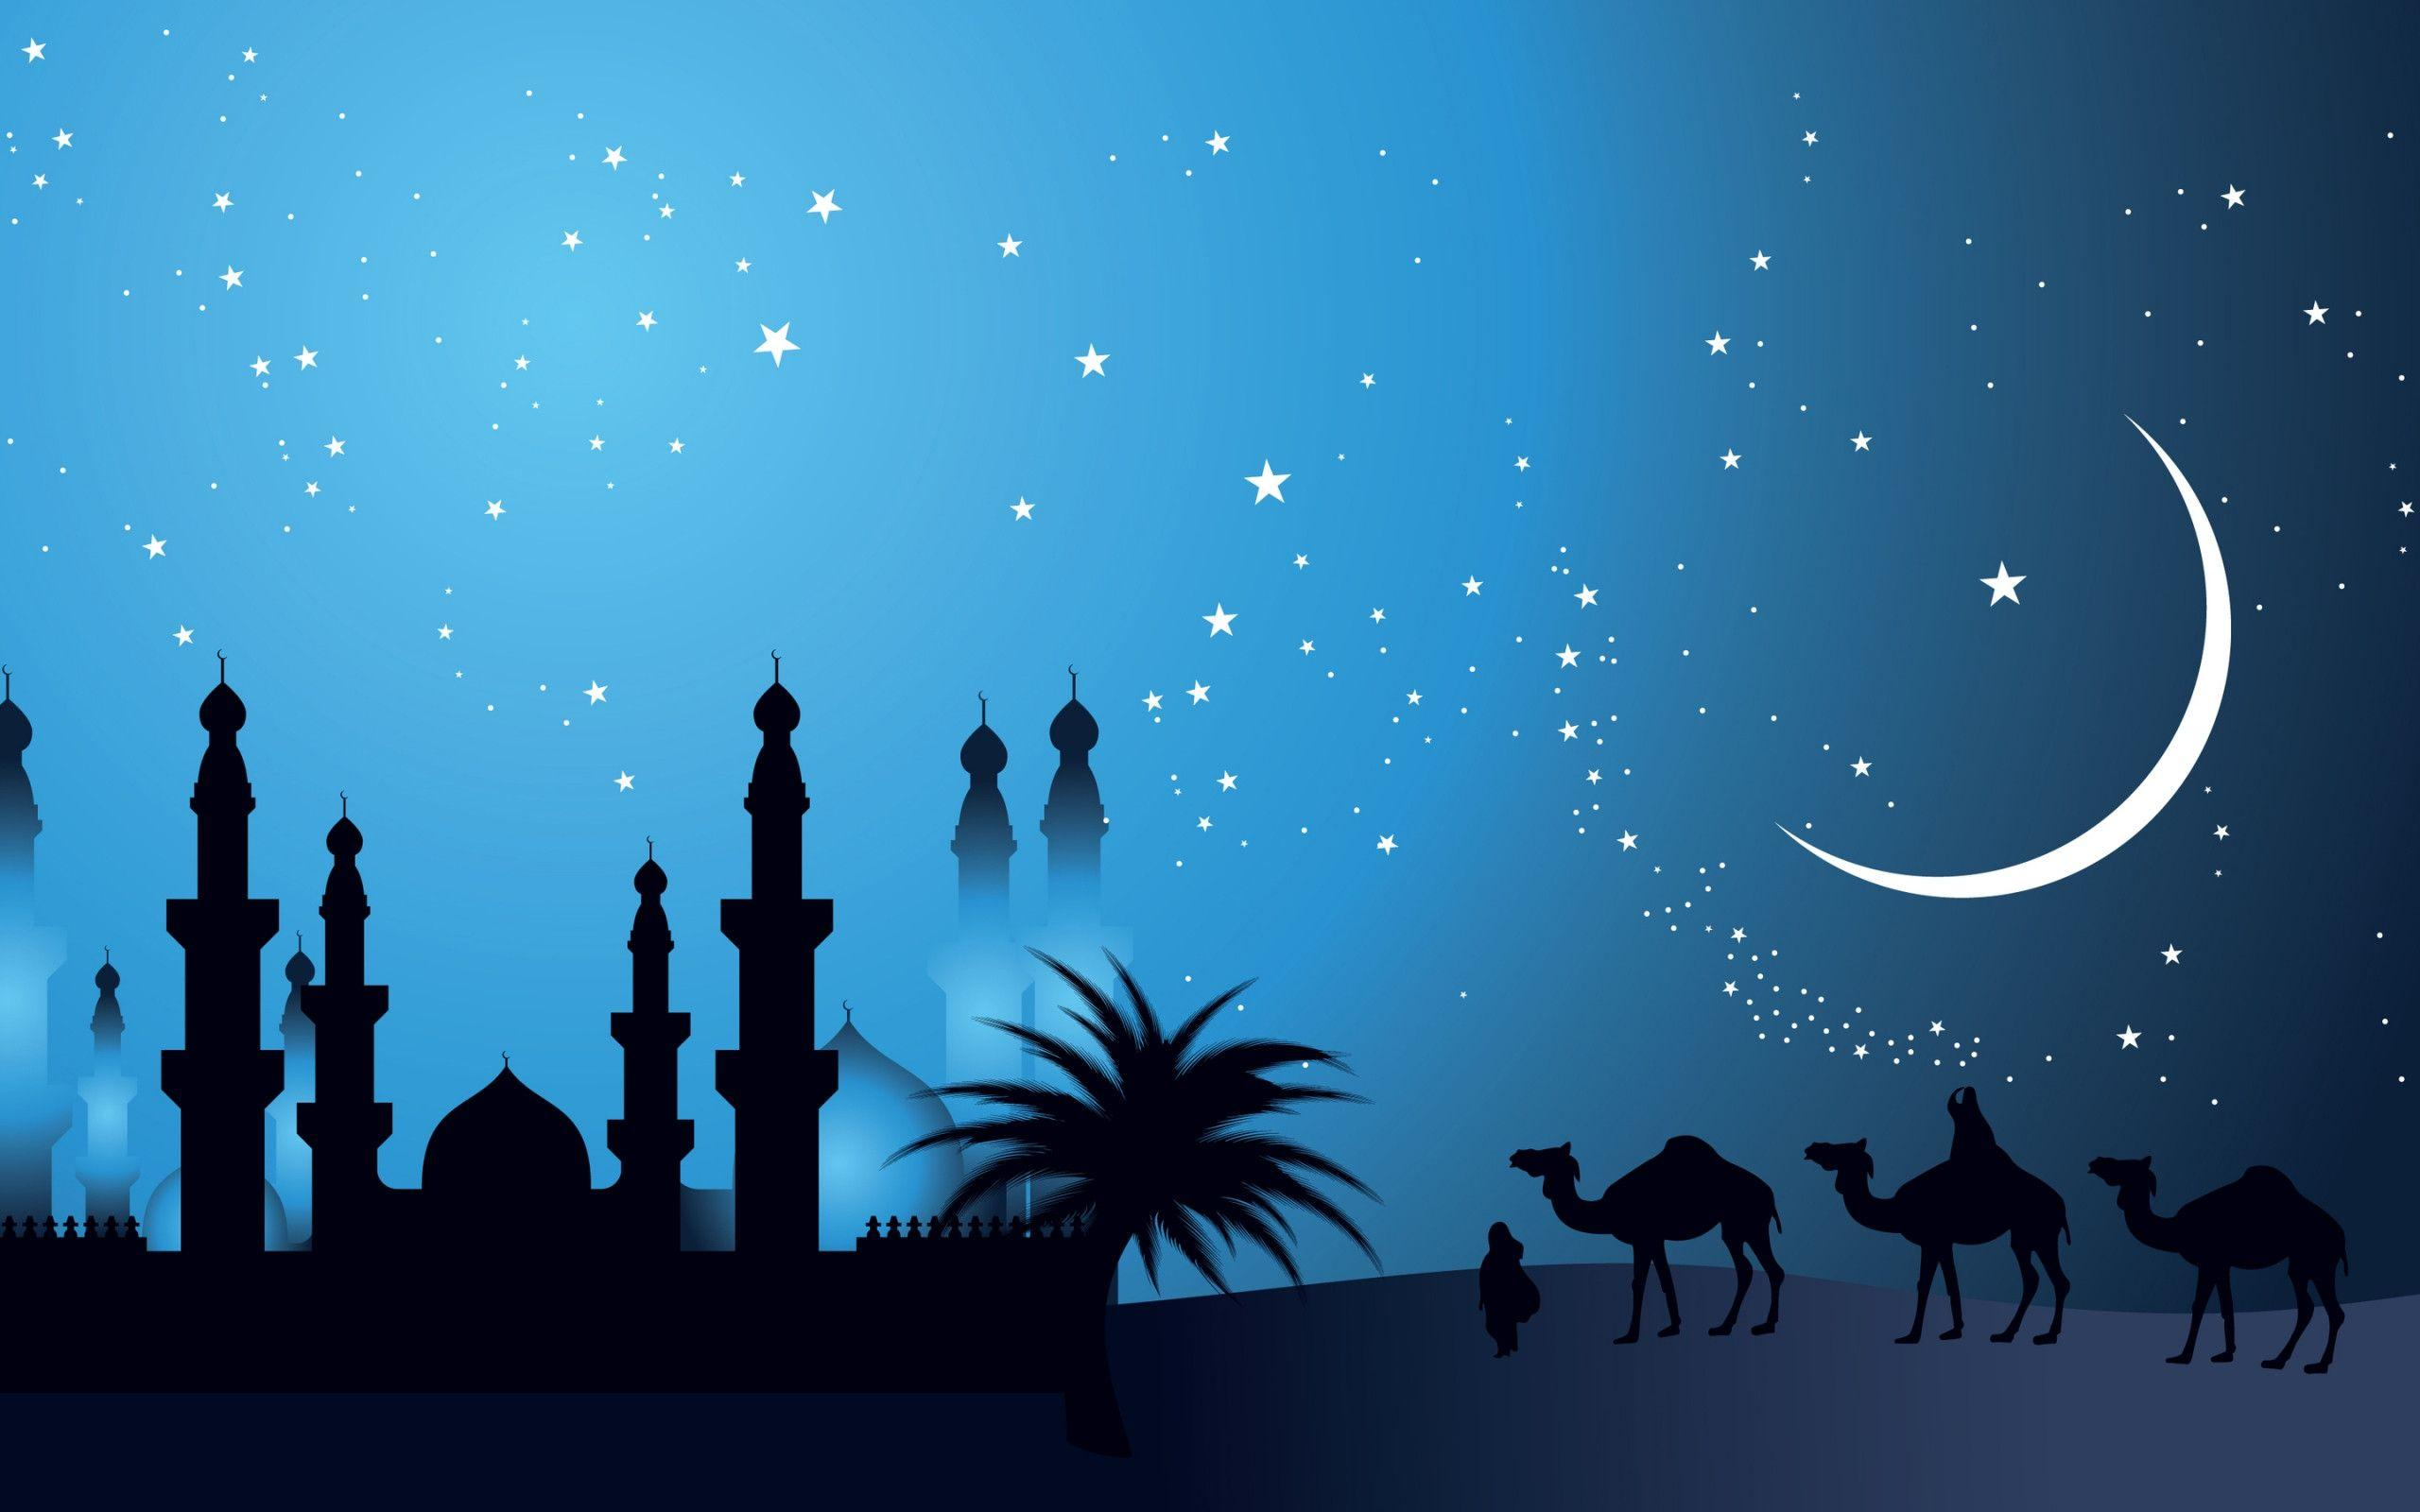 3d, Image, Islamic, Moon, Mosque, Nature, Nice